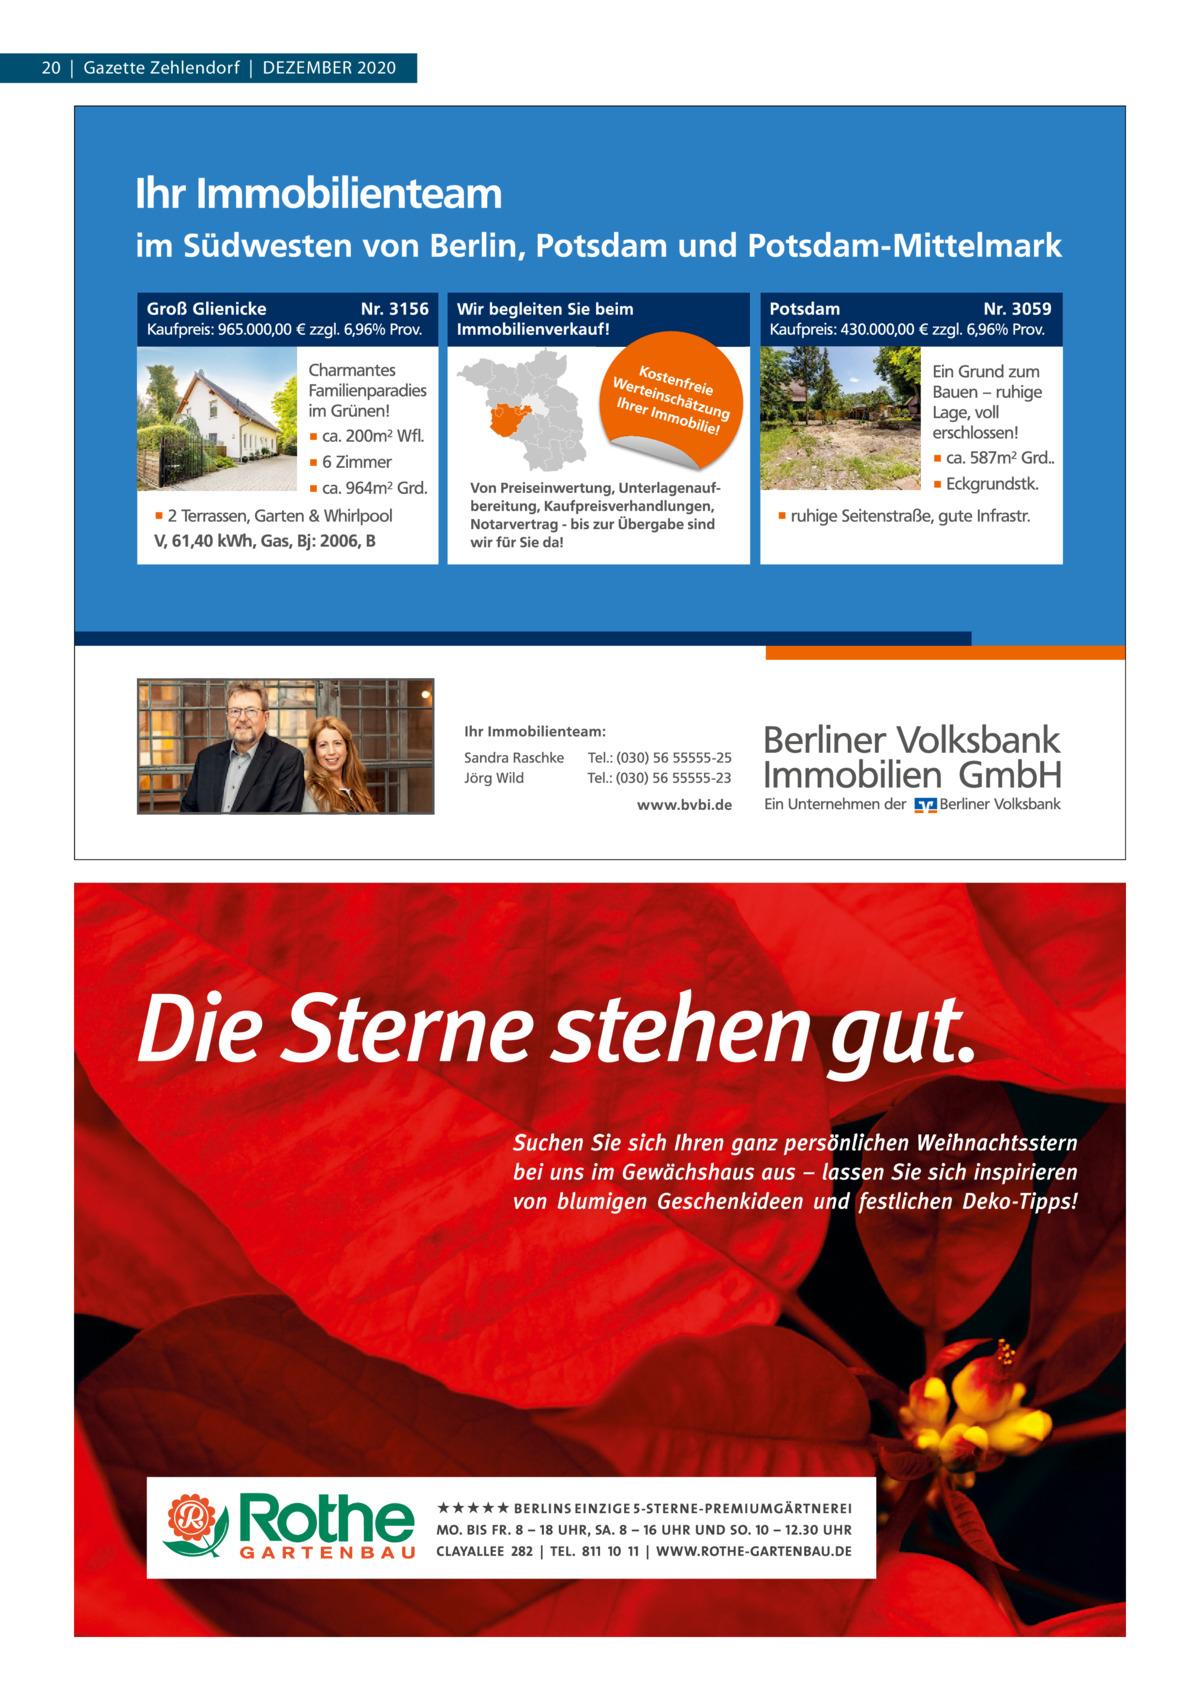 20|Gazette Zehlendorf|DEZEMBER 2020